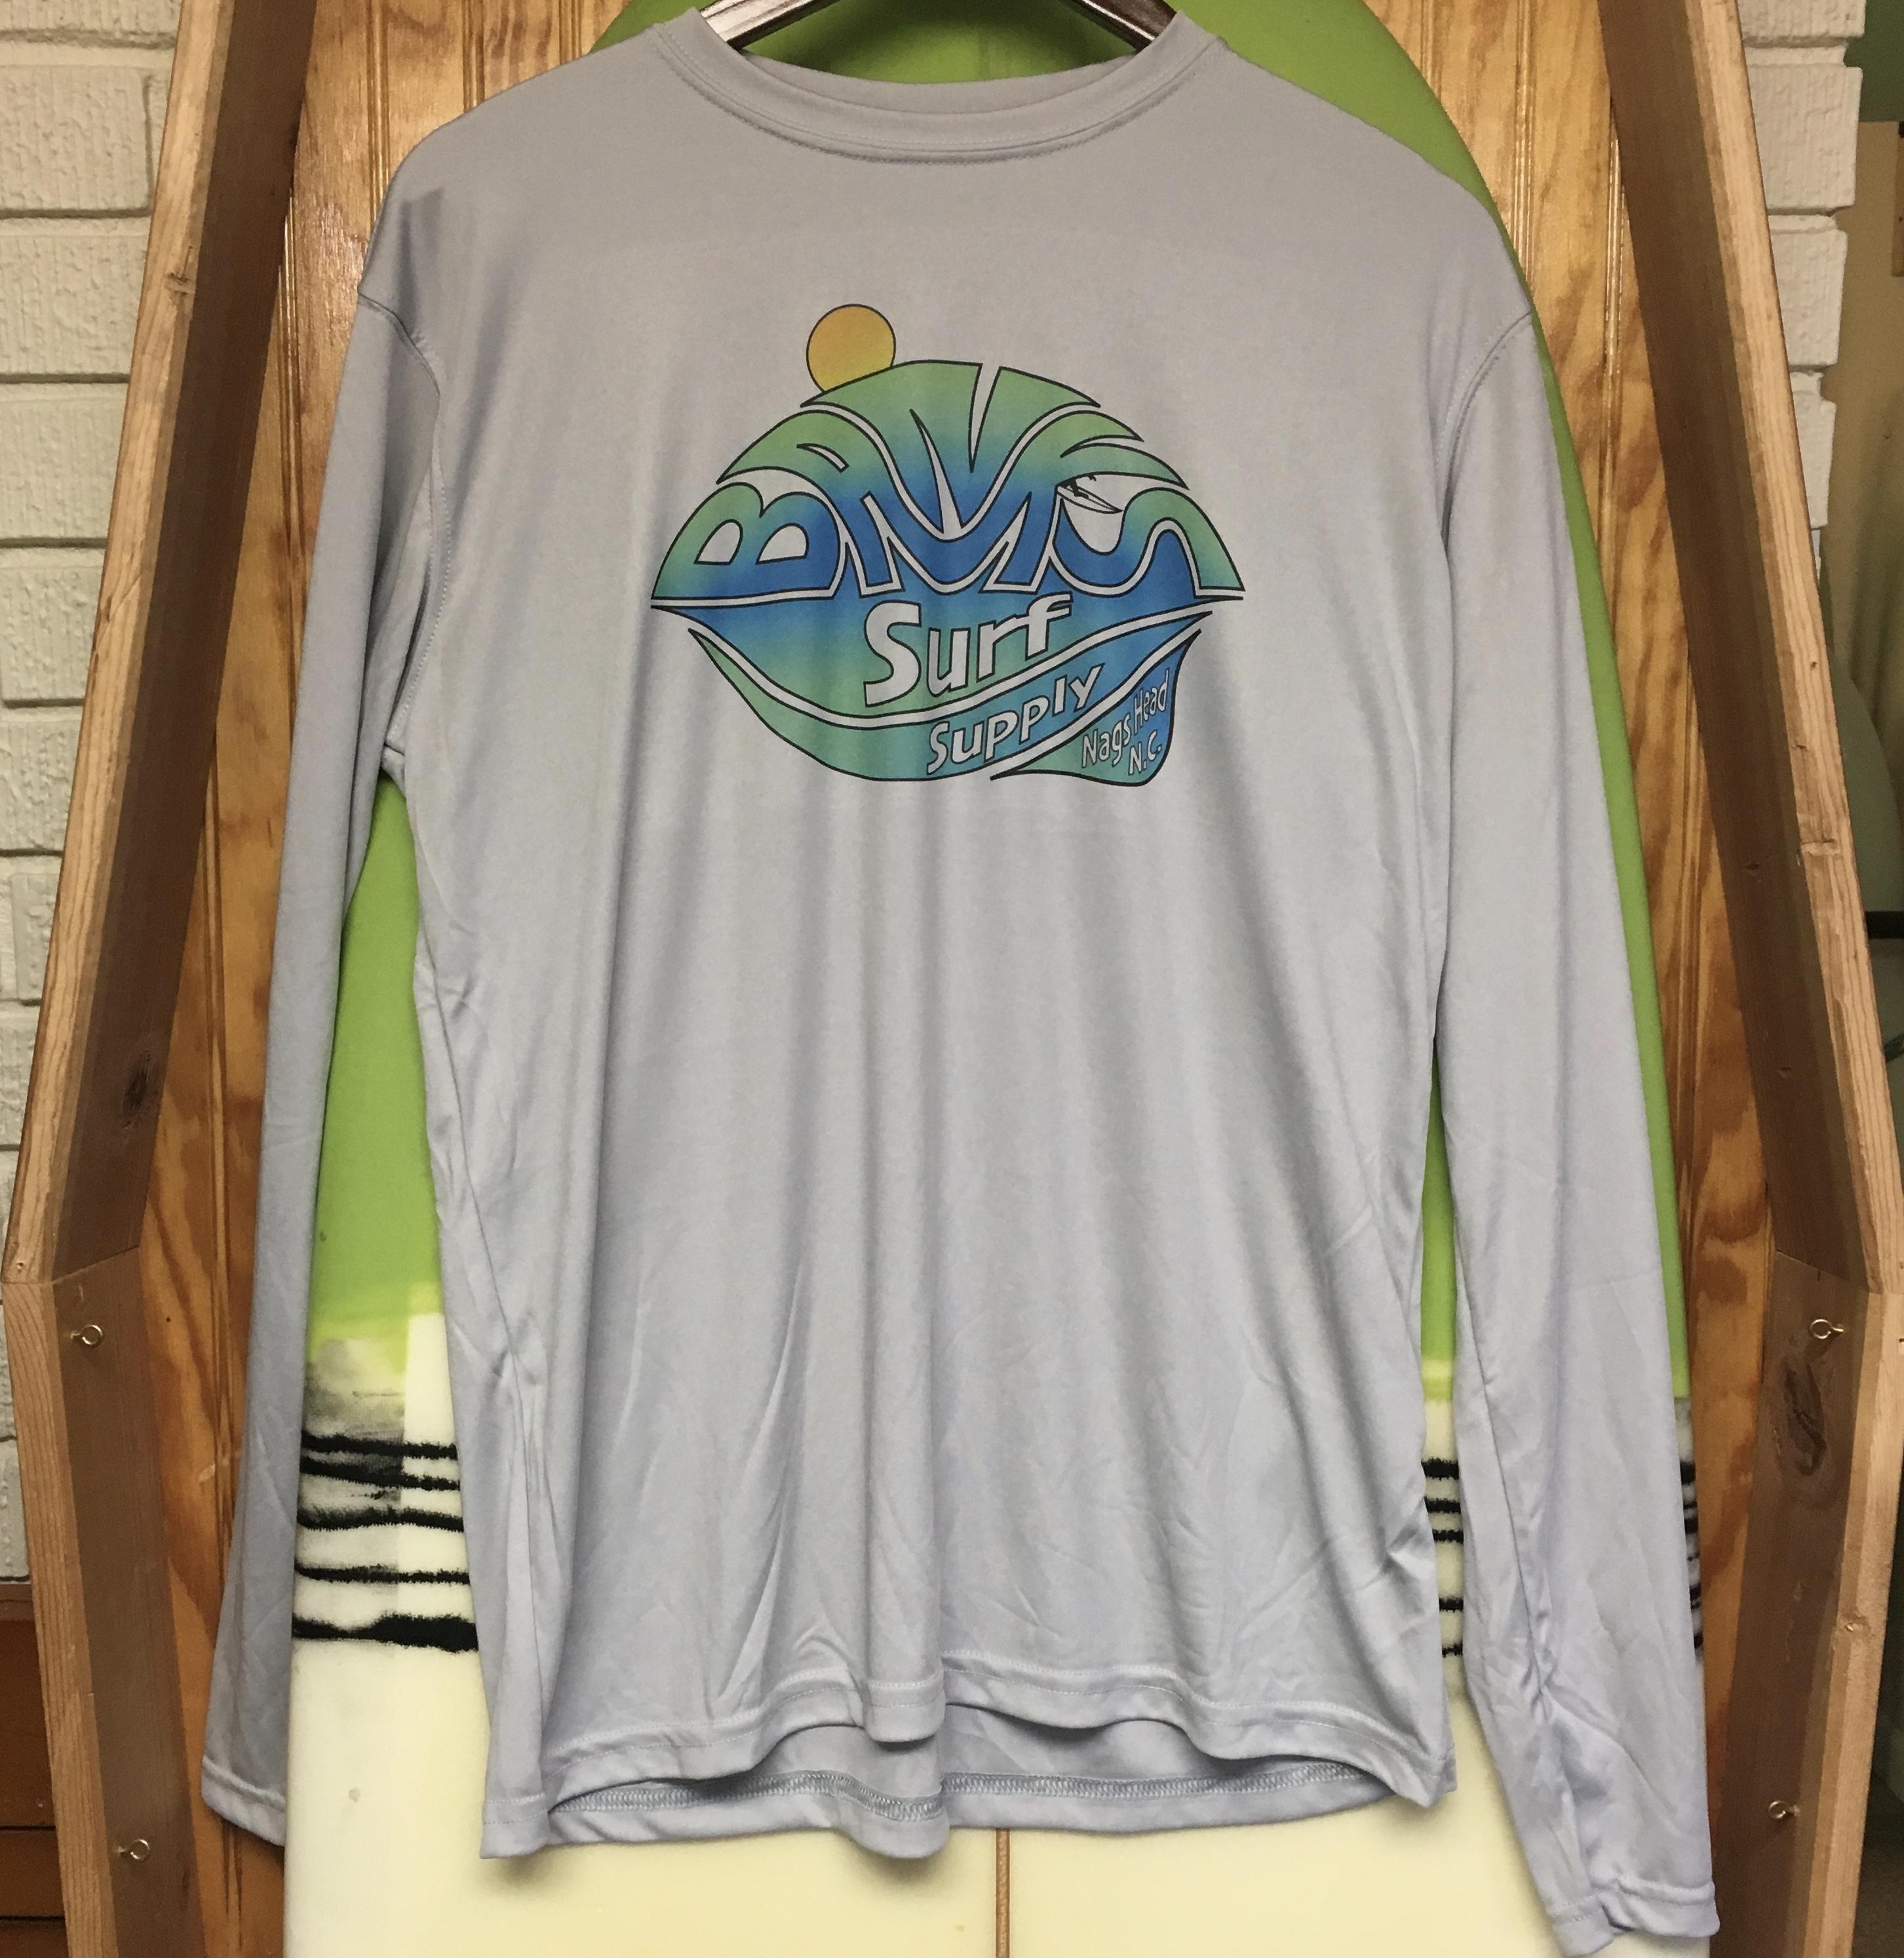 e46b39a3 ... 3/4 Sleeve Raglan Triblend White/Kelly Green. $27.95. Banks Surf Supply  A-Frame Solar Long Sleeve Tee